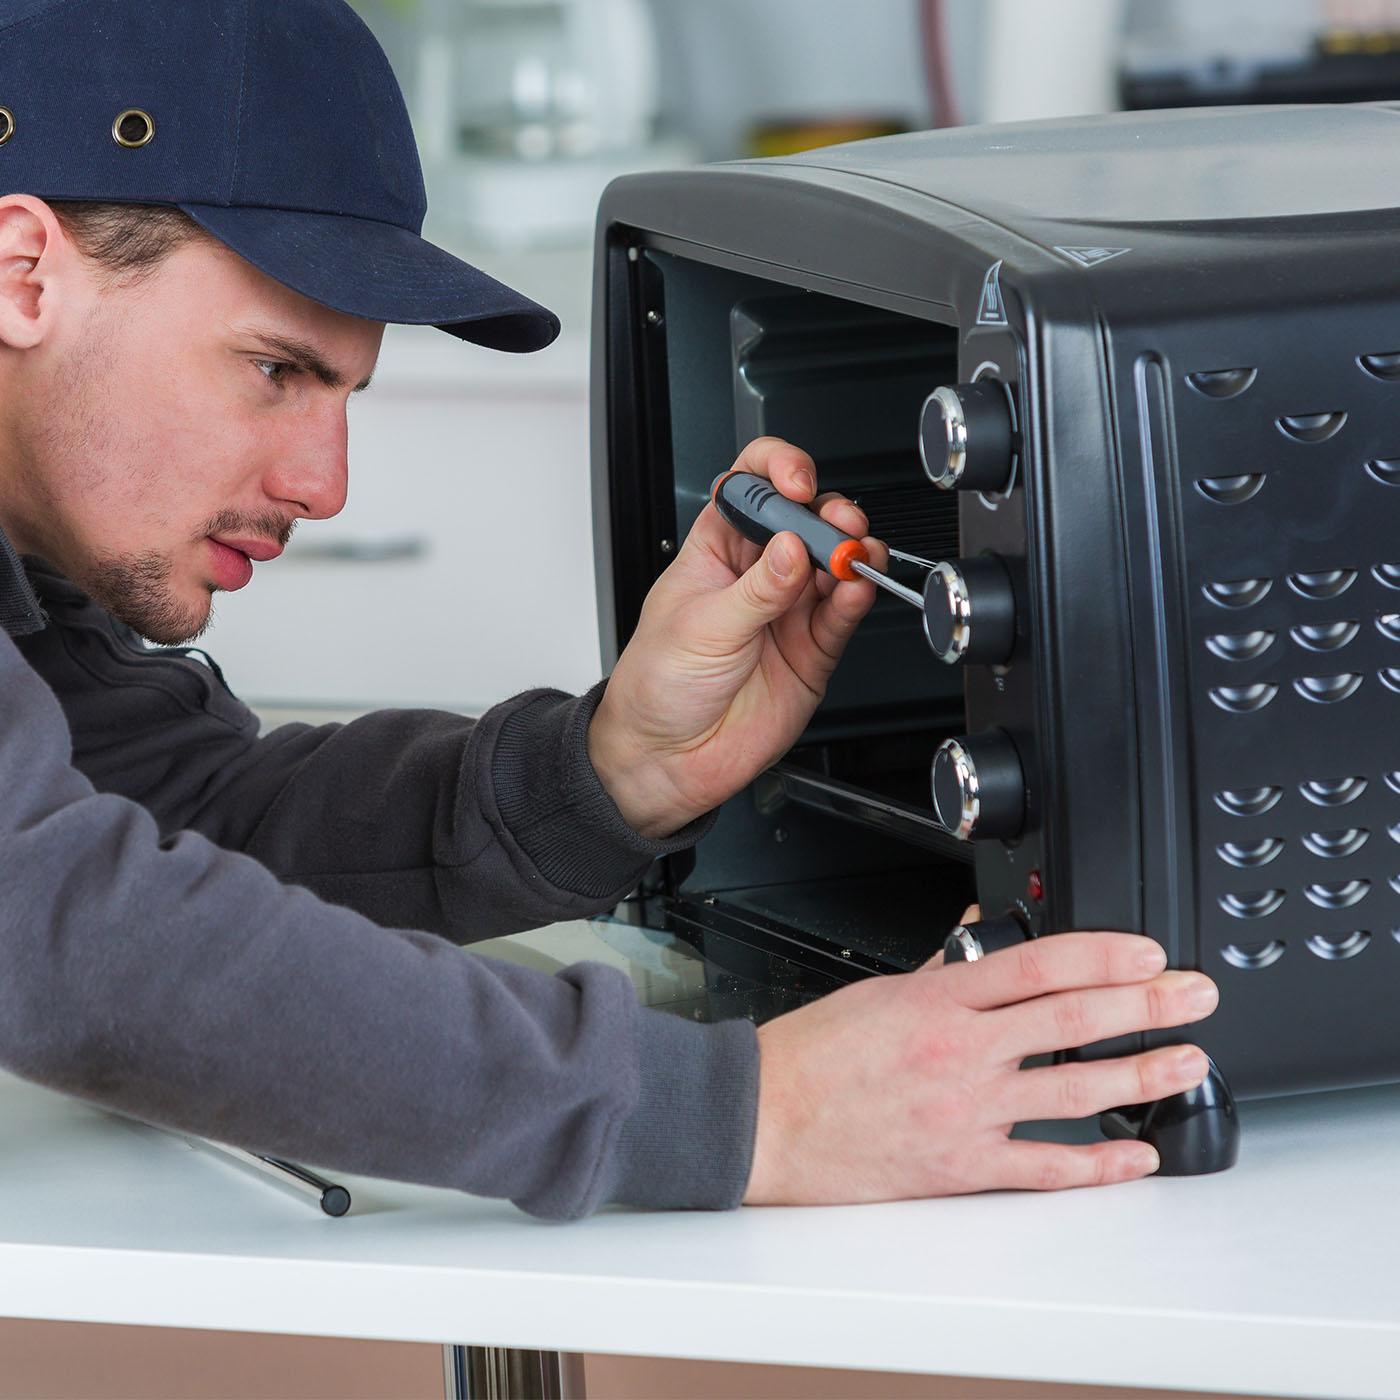 microwave repair toronto low cost